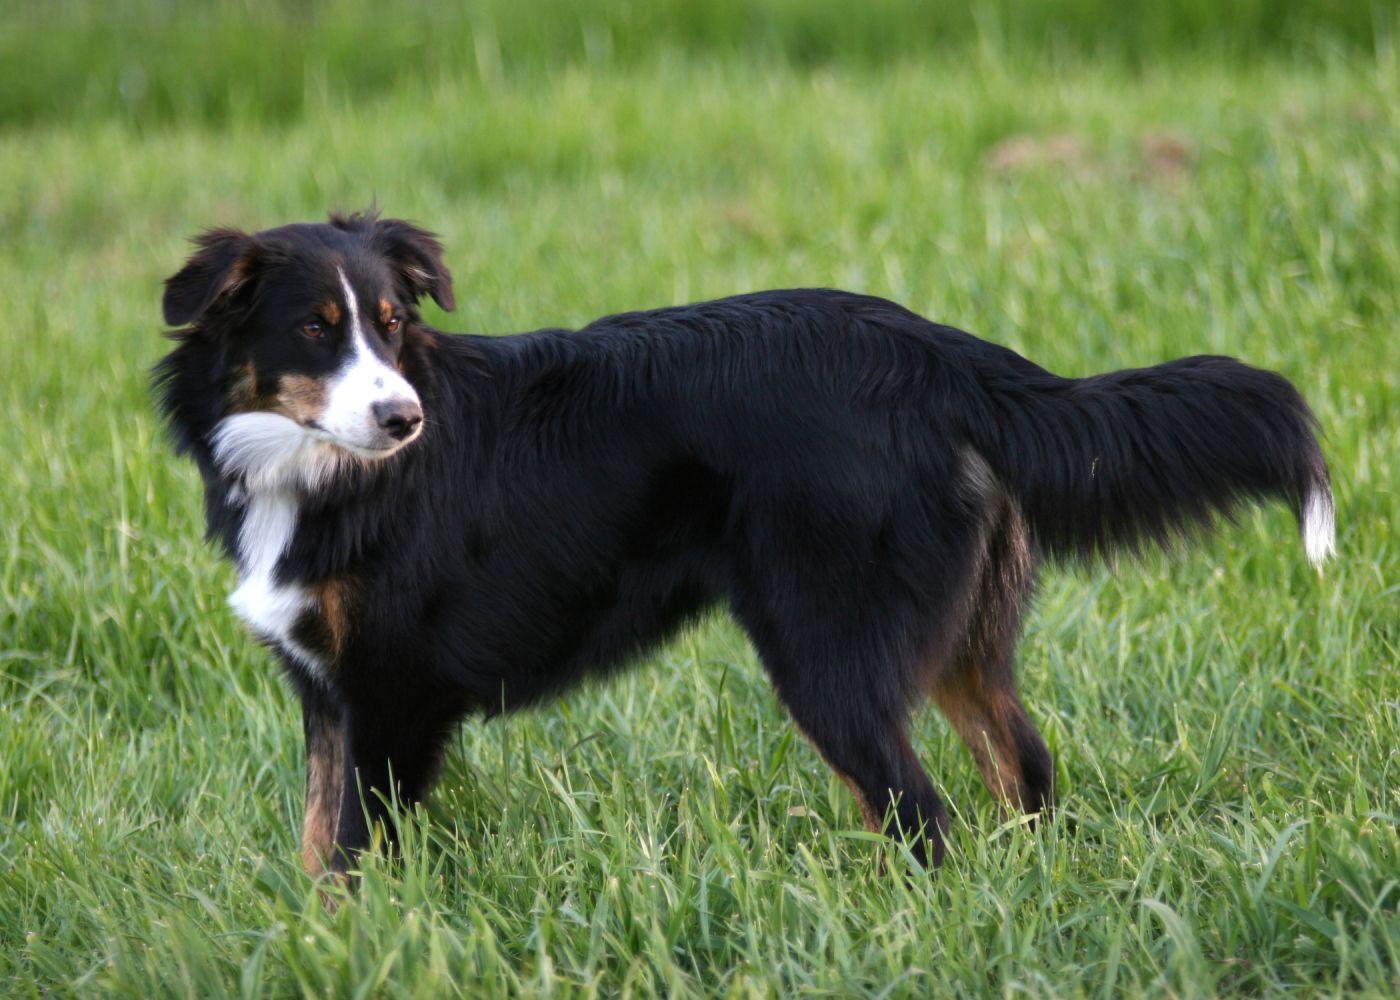 Snowy River S Bess English Shepherd Dog Breeds Medium Dog Breeds